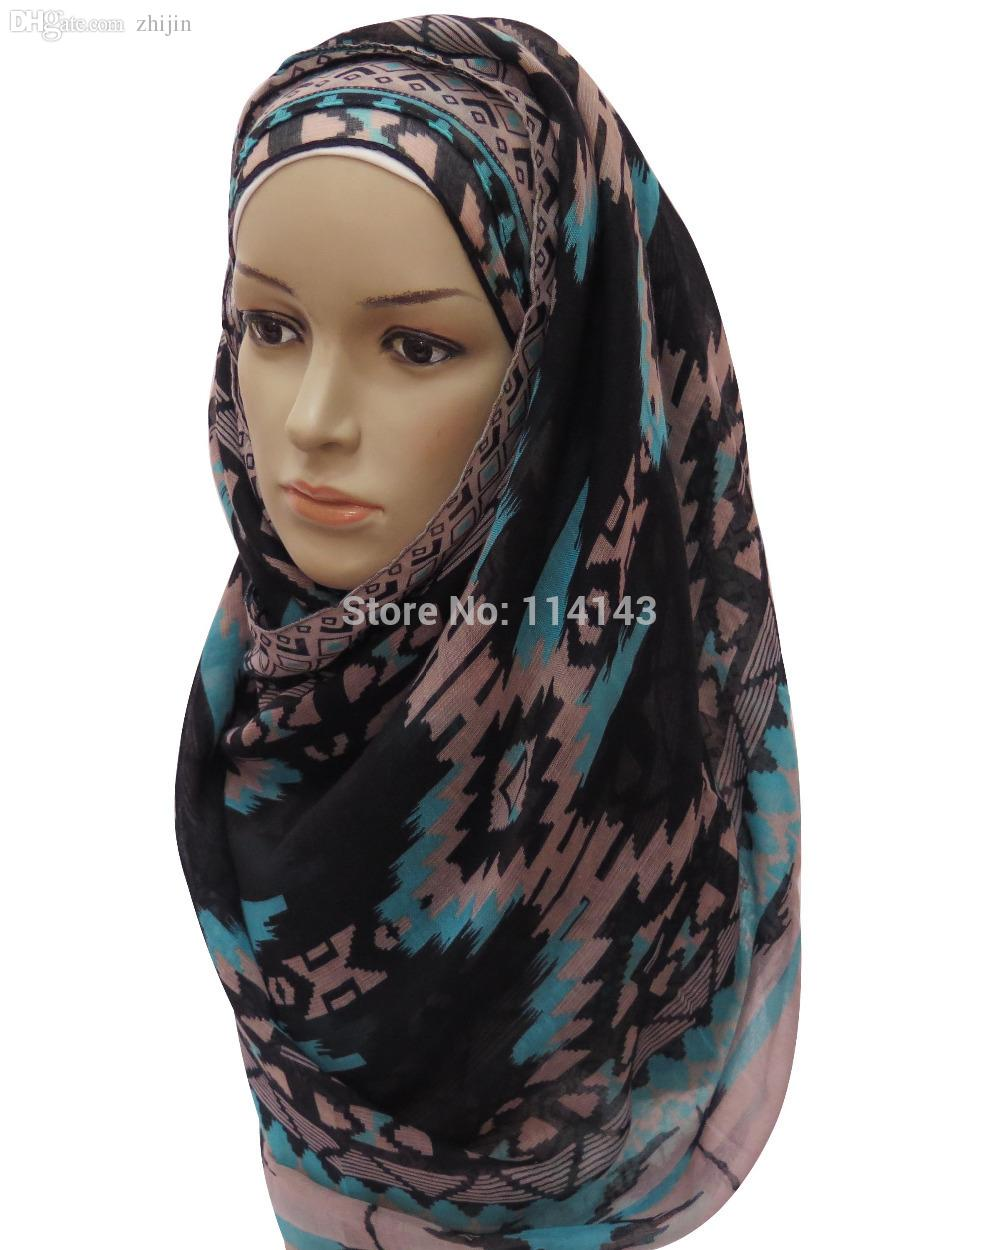 Großhandels-10pcs / lot Stammes- aztekische Boho Geo-Druck-Frauen langer Schal-Moslem-Hijab-Verpackung, freies Verschiffen